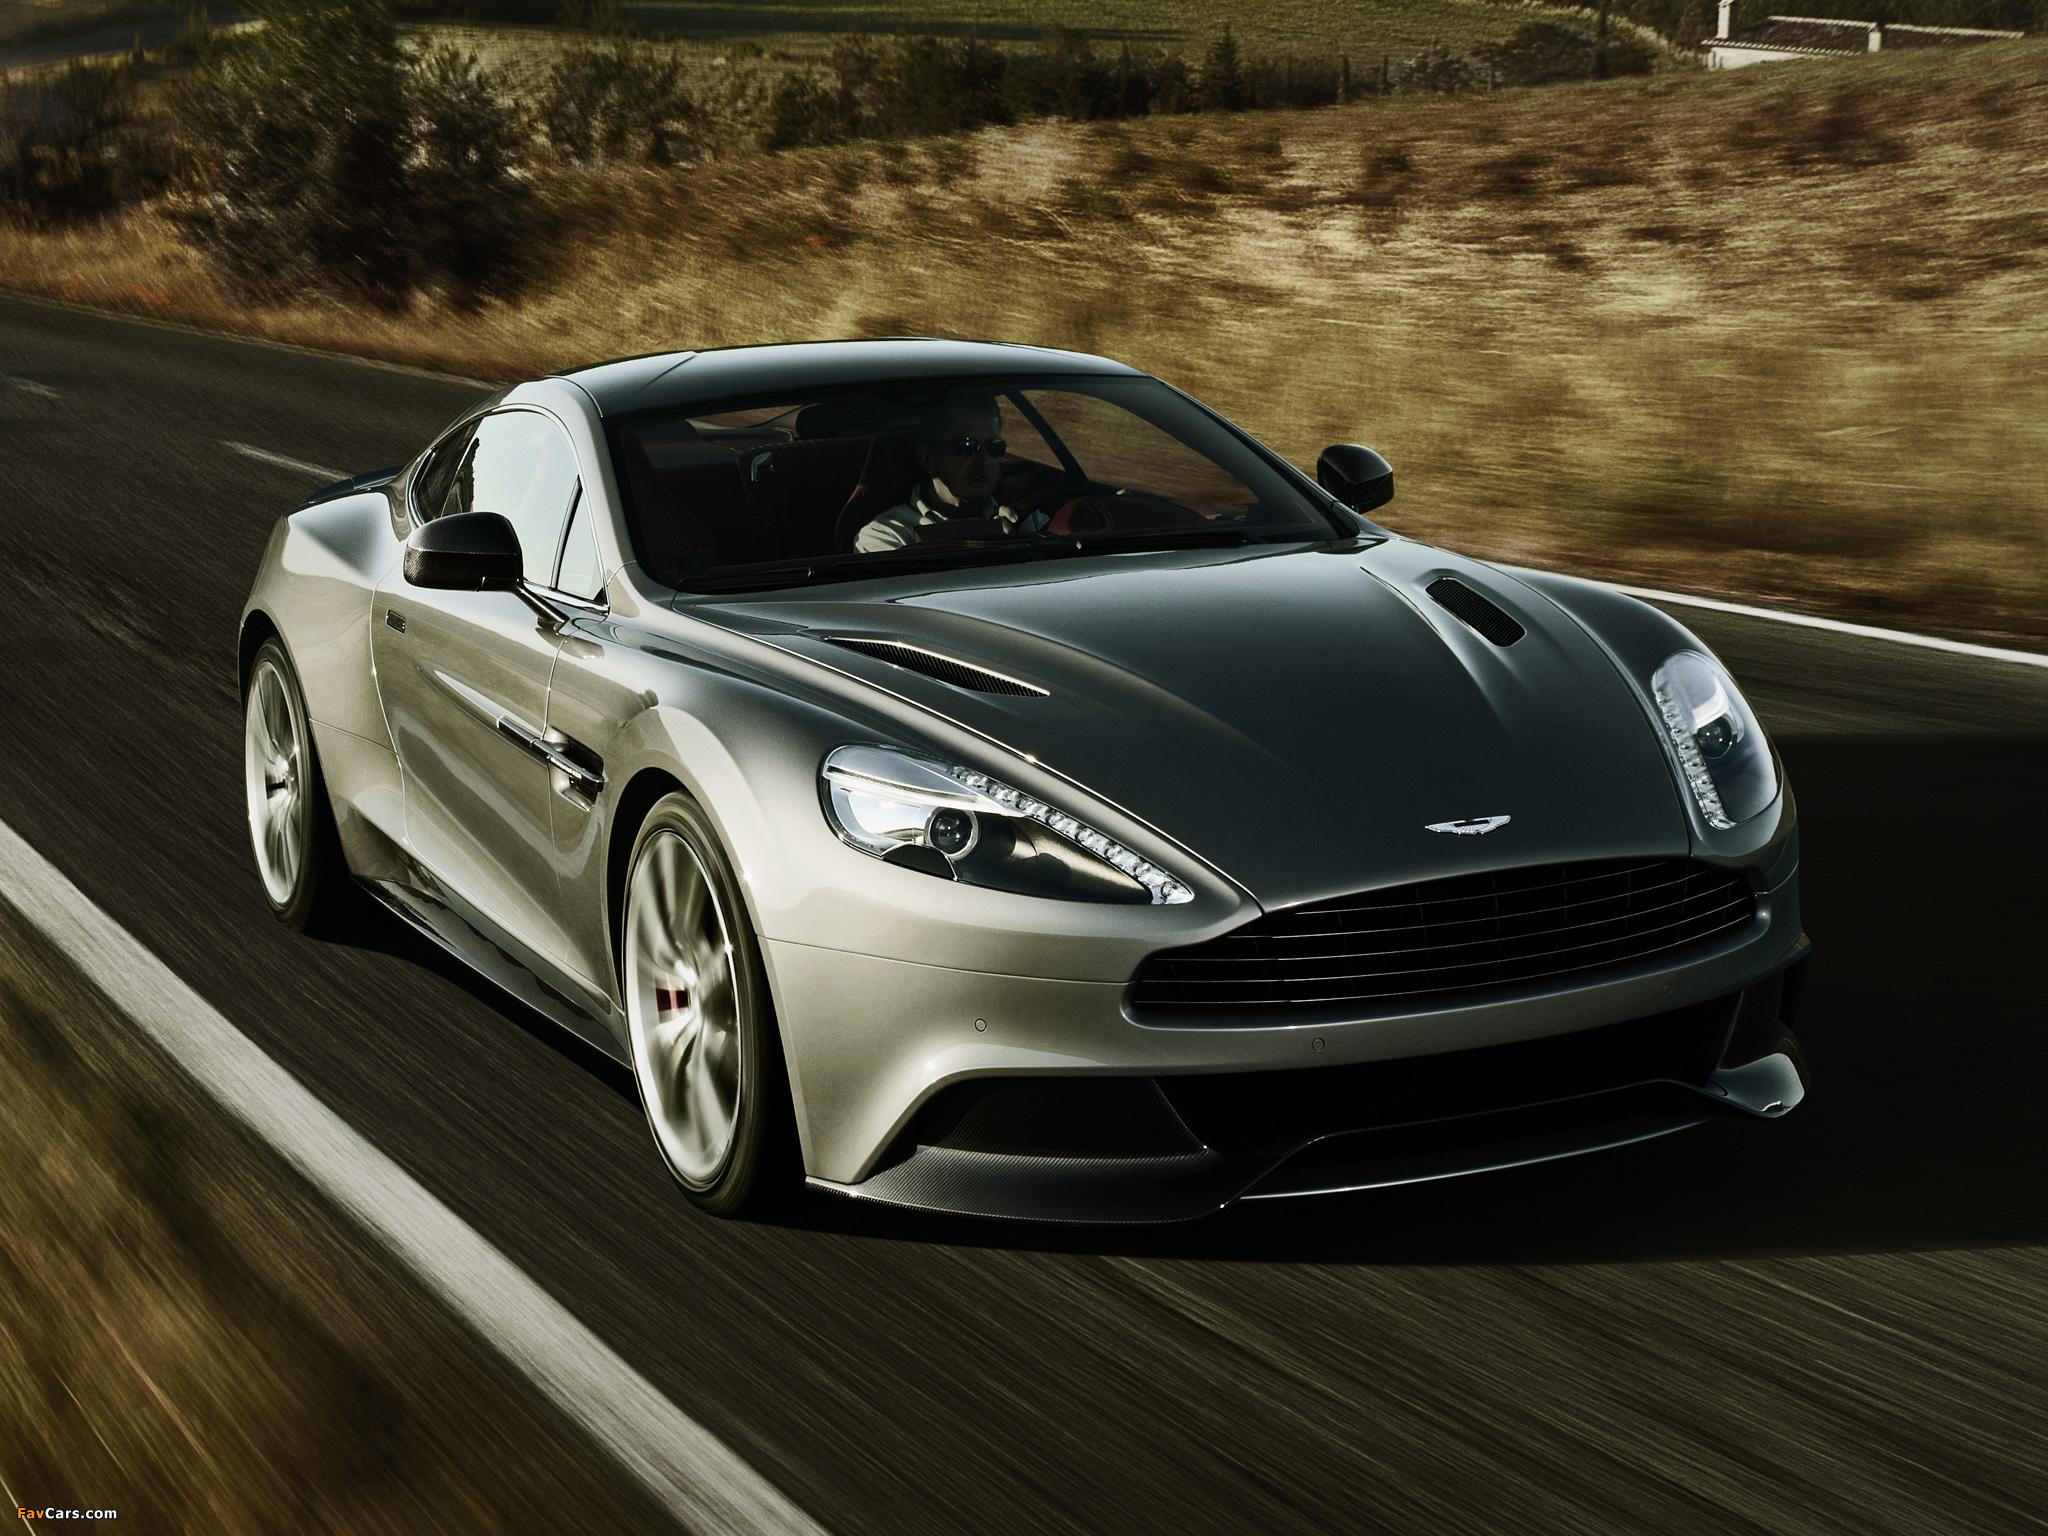 Photos Of Aston Martin Vanquish 2012 2048x1536